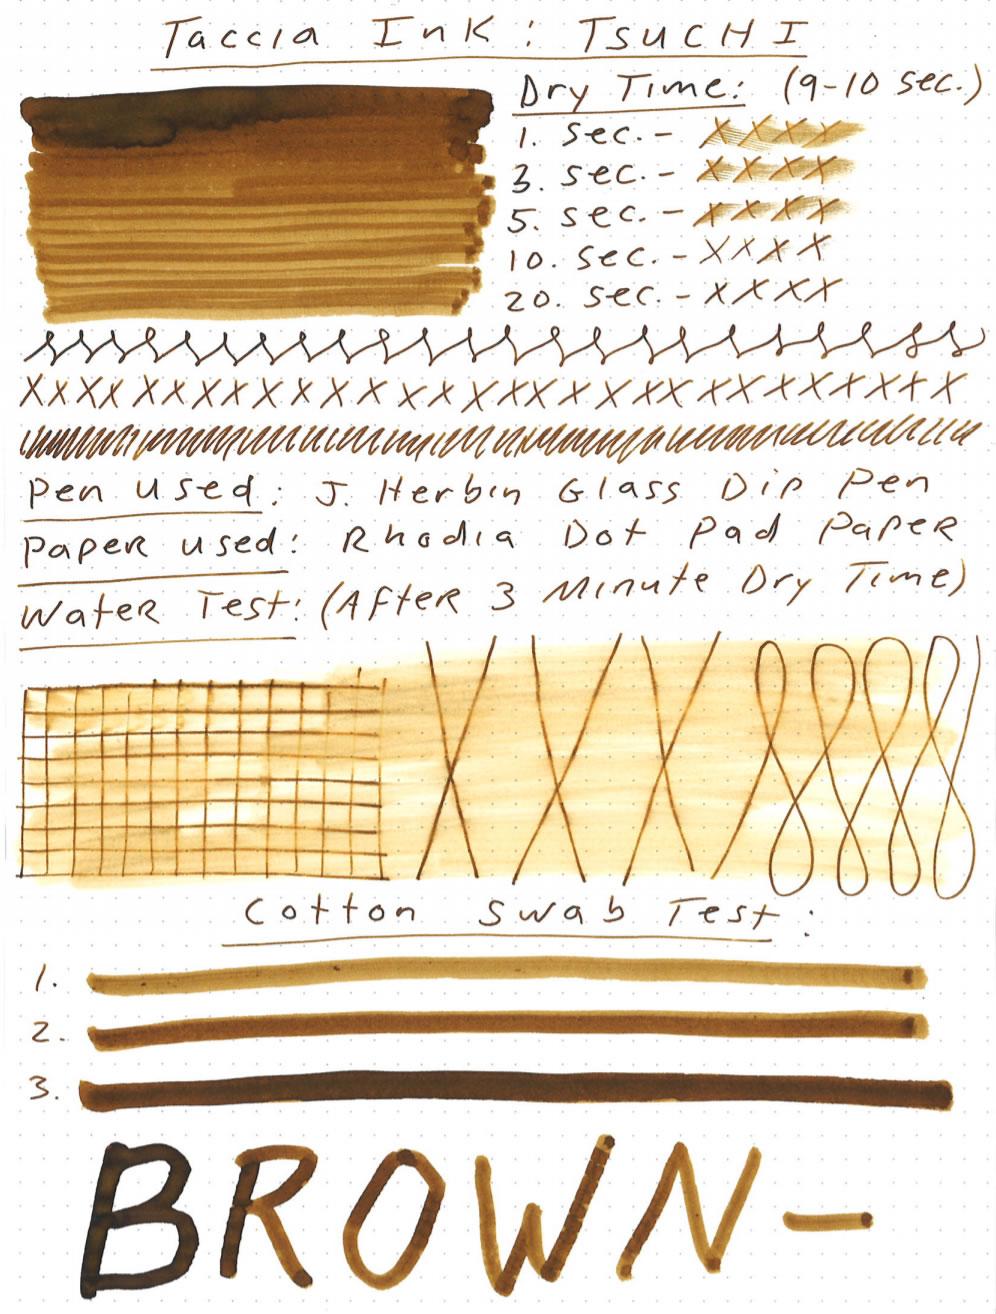 Taccia Tsuchi Golden Wheat Ink